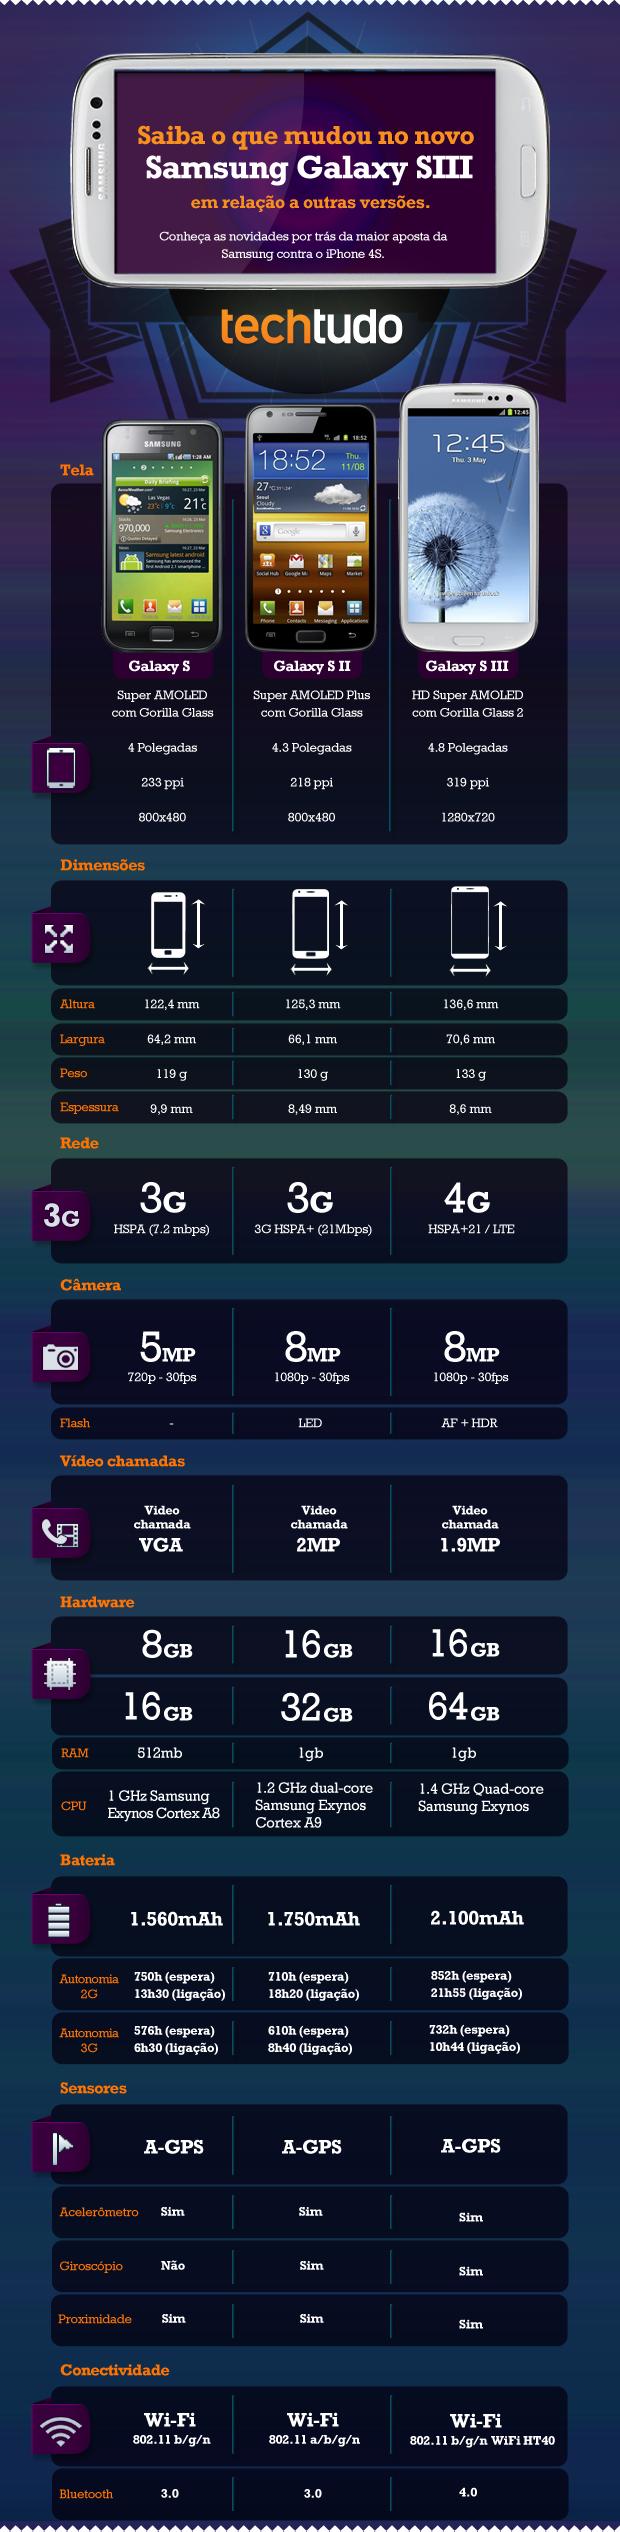 Samsung Galaxy SIII Comparativo V6 (Foto: TechTudo)